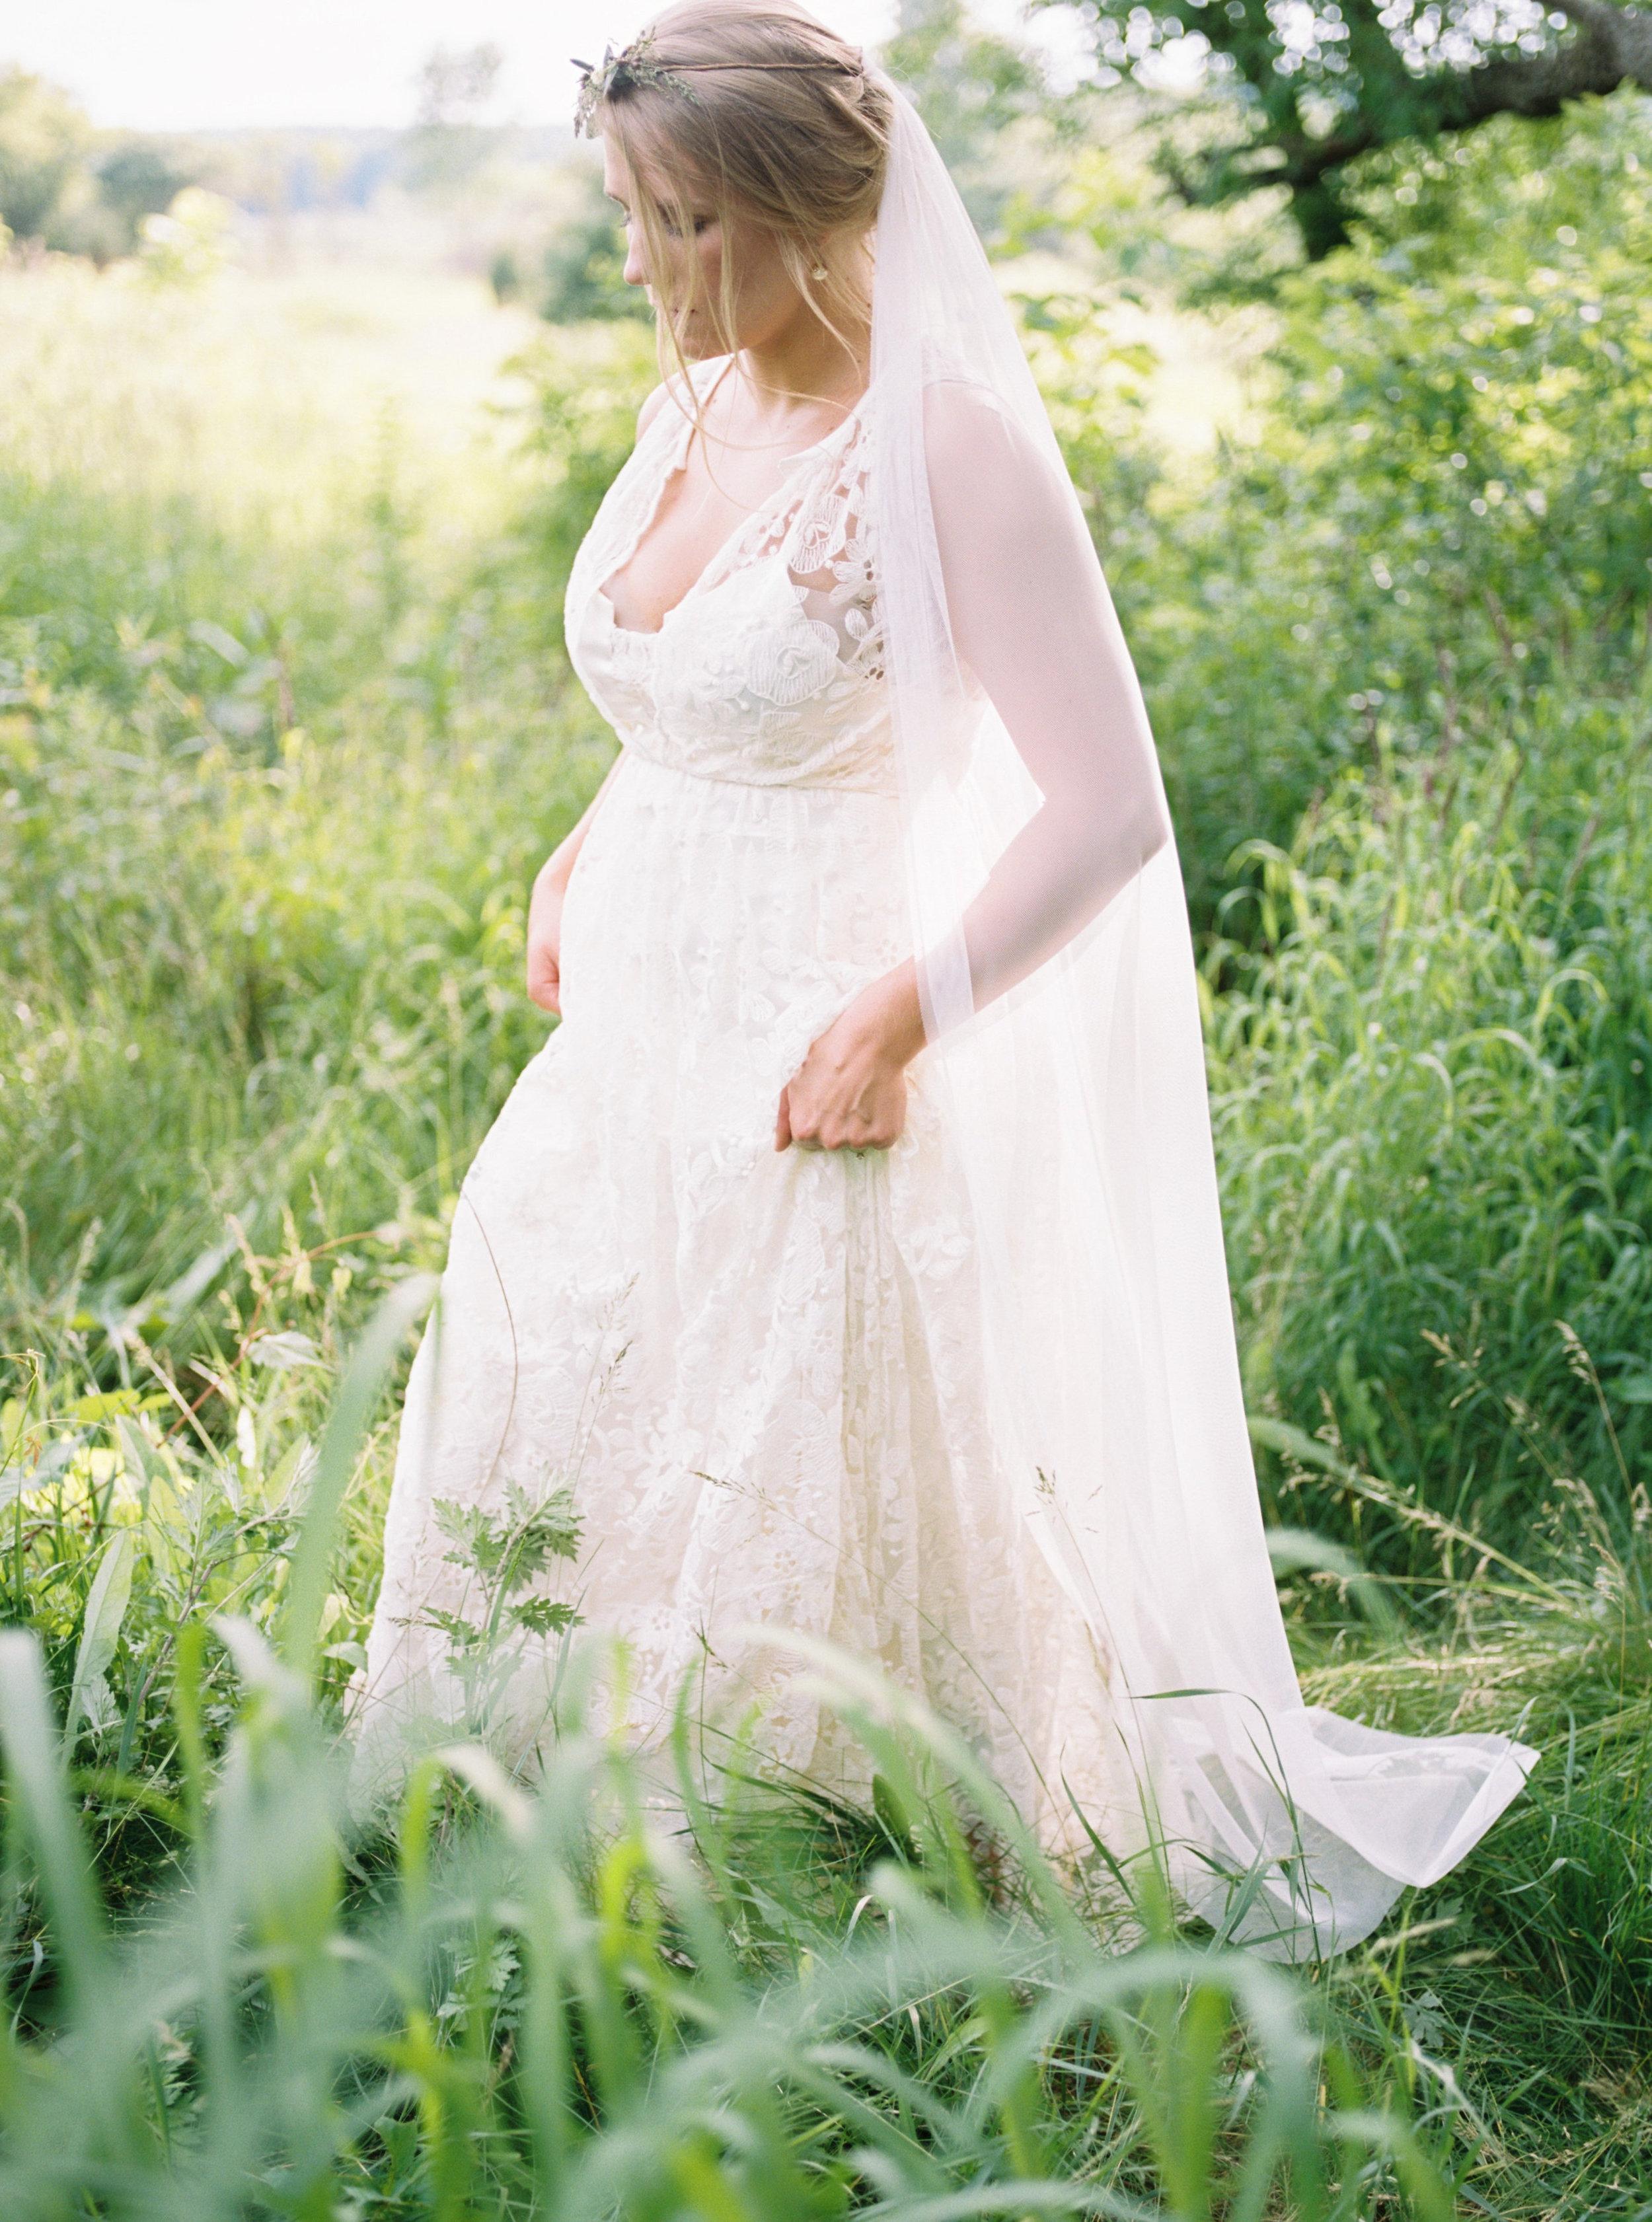 greenhouse-wedding-inspiration-by-laurelyn-savannah-photography-35.jpg